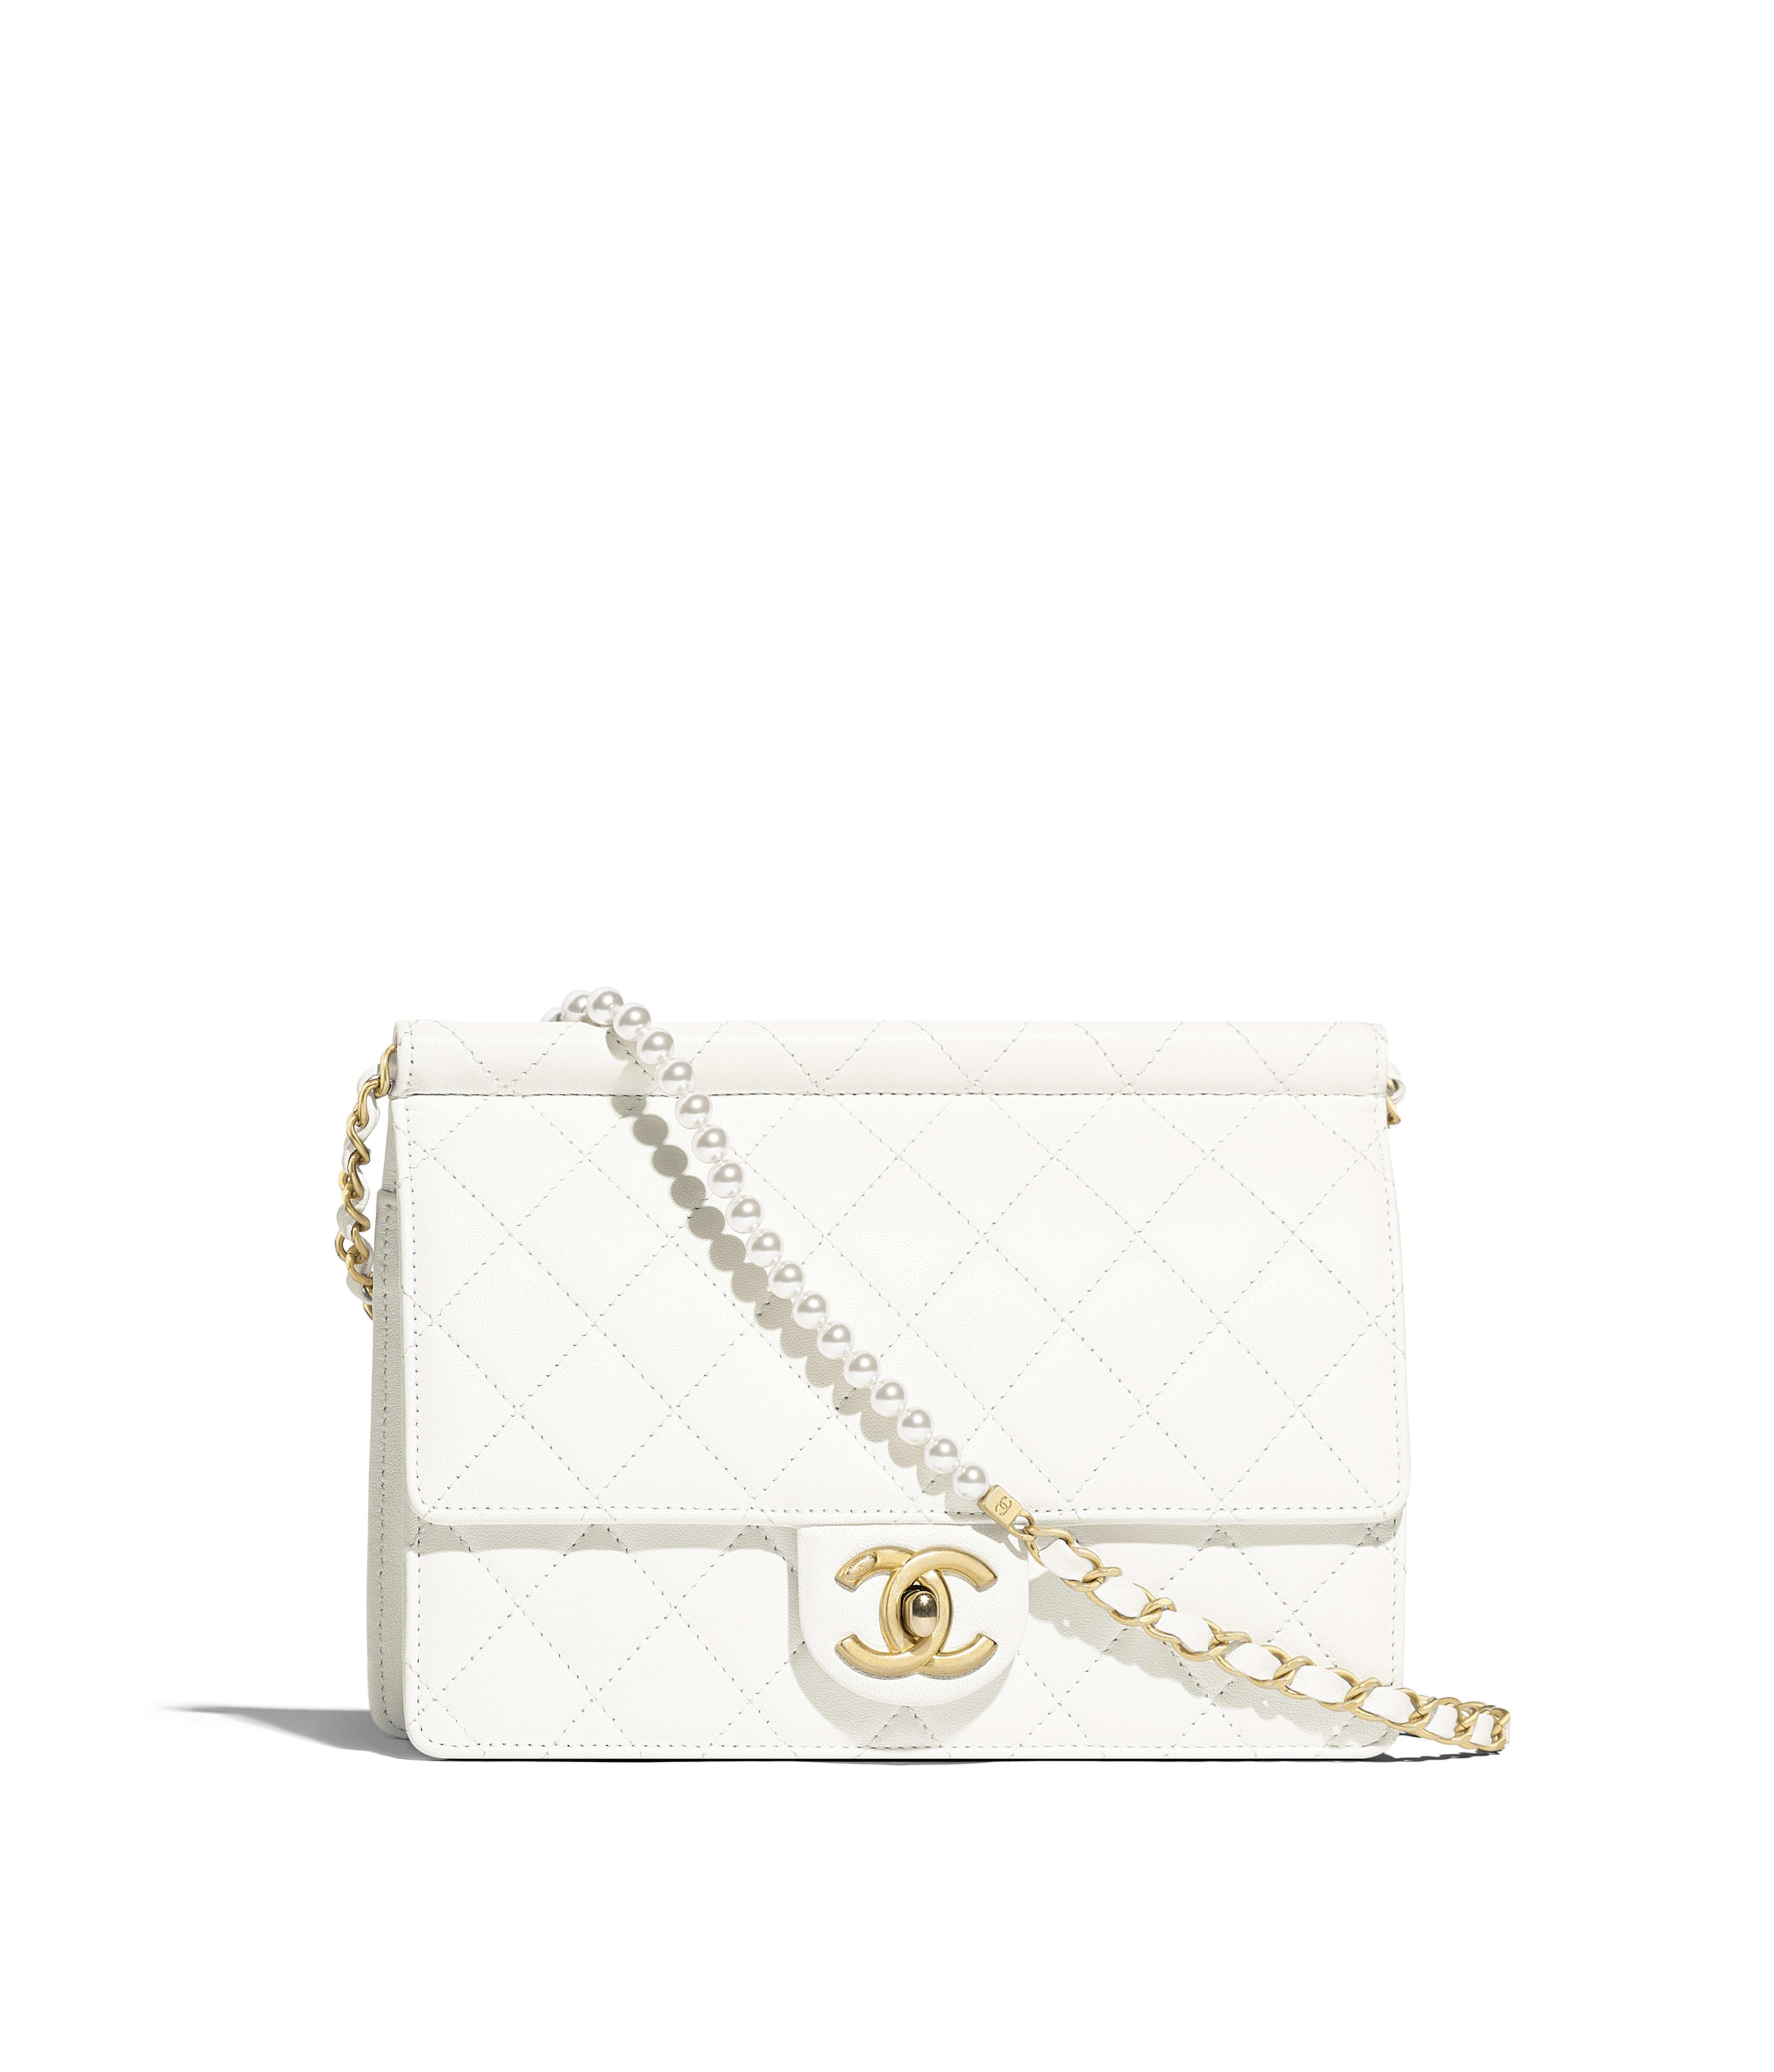 7d9c4cbfef5a Flap Bag Lambskin, Imitation Pearls & Gold-Tone Metal, White Ref.  AS0582B0037110601